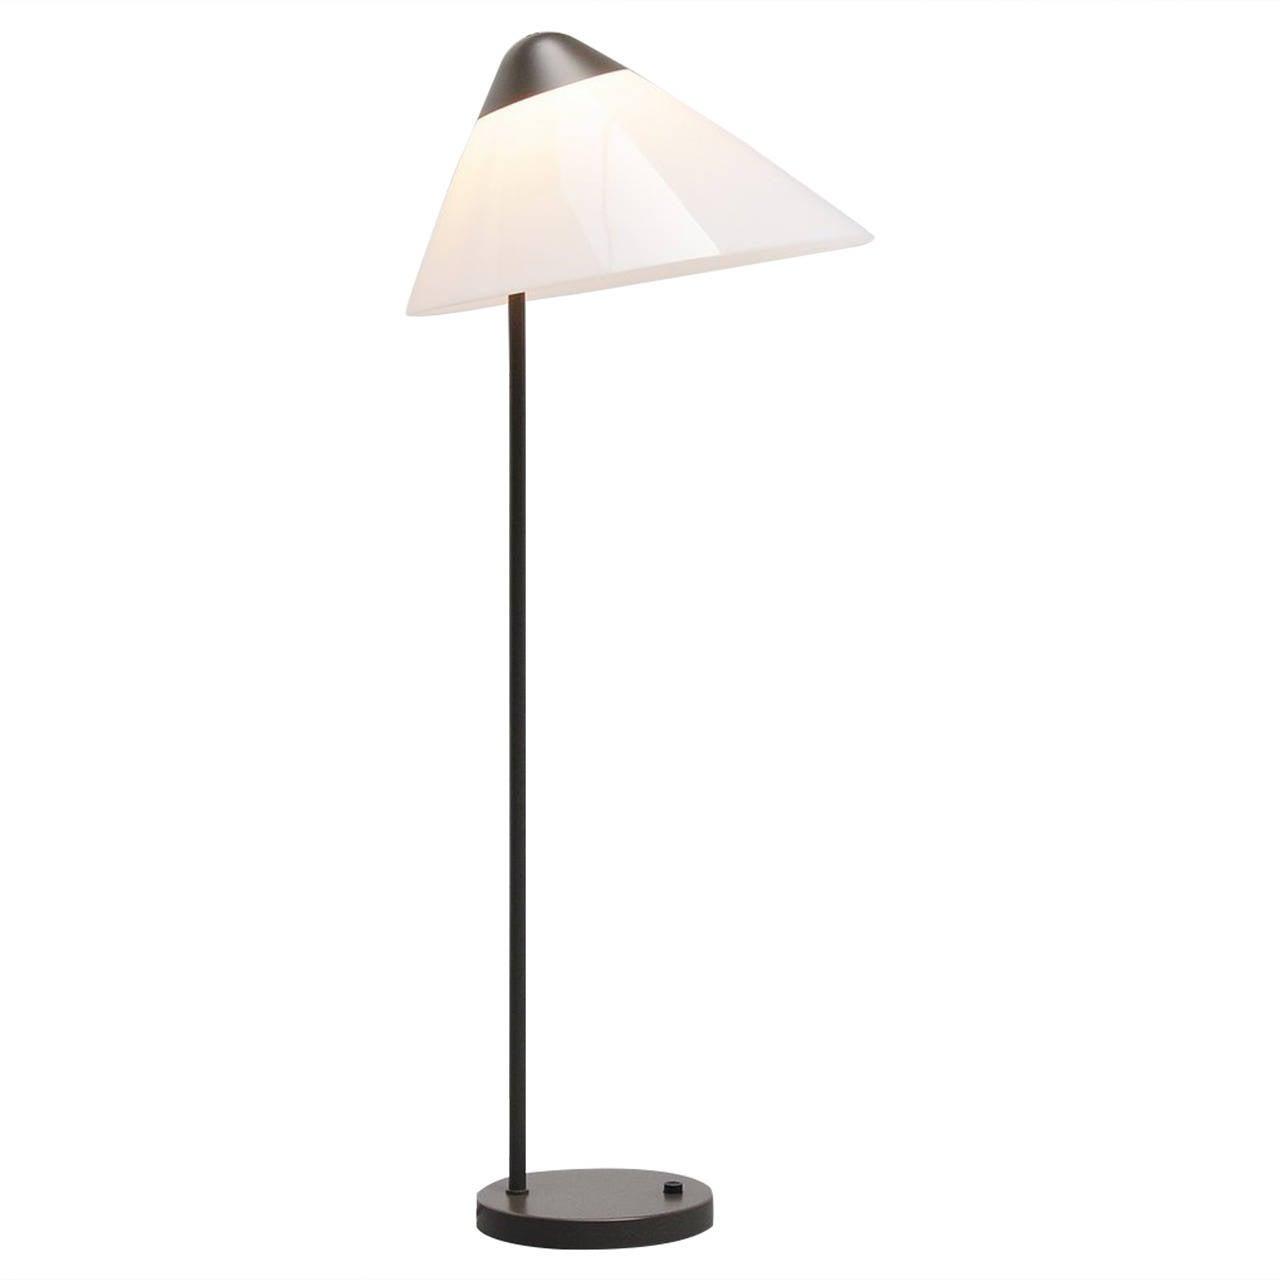 Splinternye Hans Wegner Opala Floor Lamp, Louis Poulsen 1975 For Sale at 1stdibs OF-13